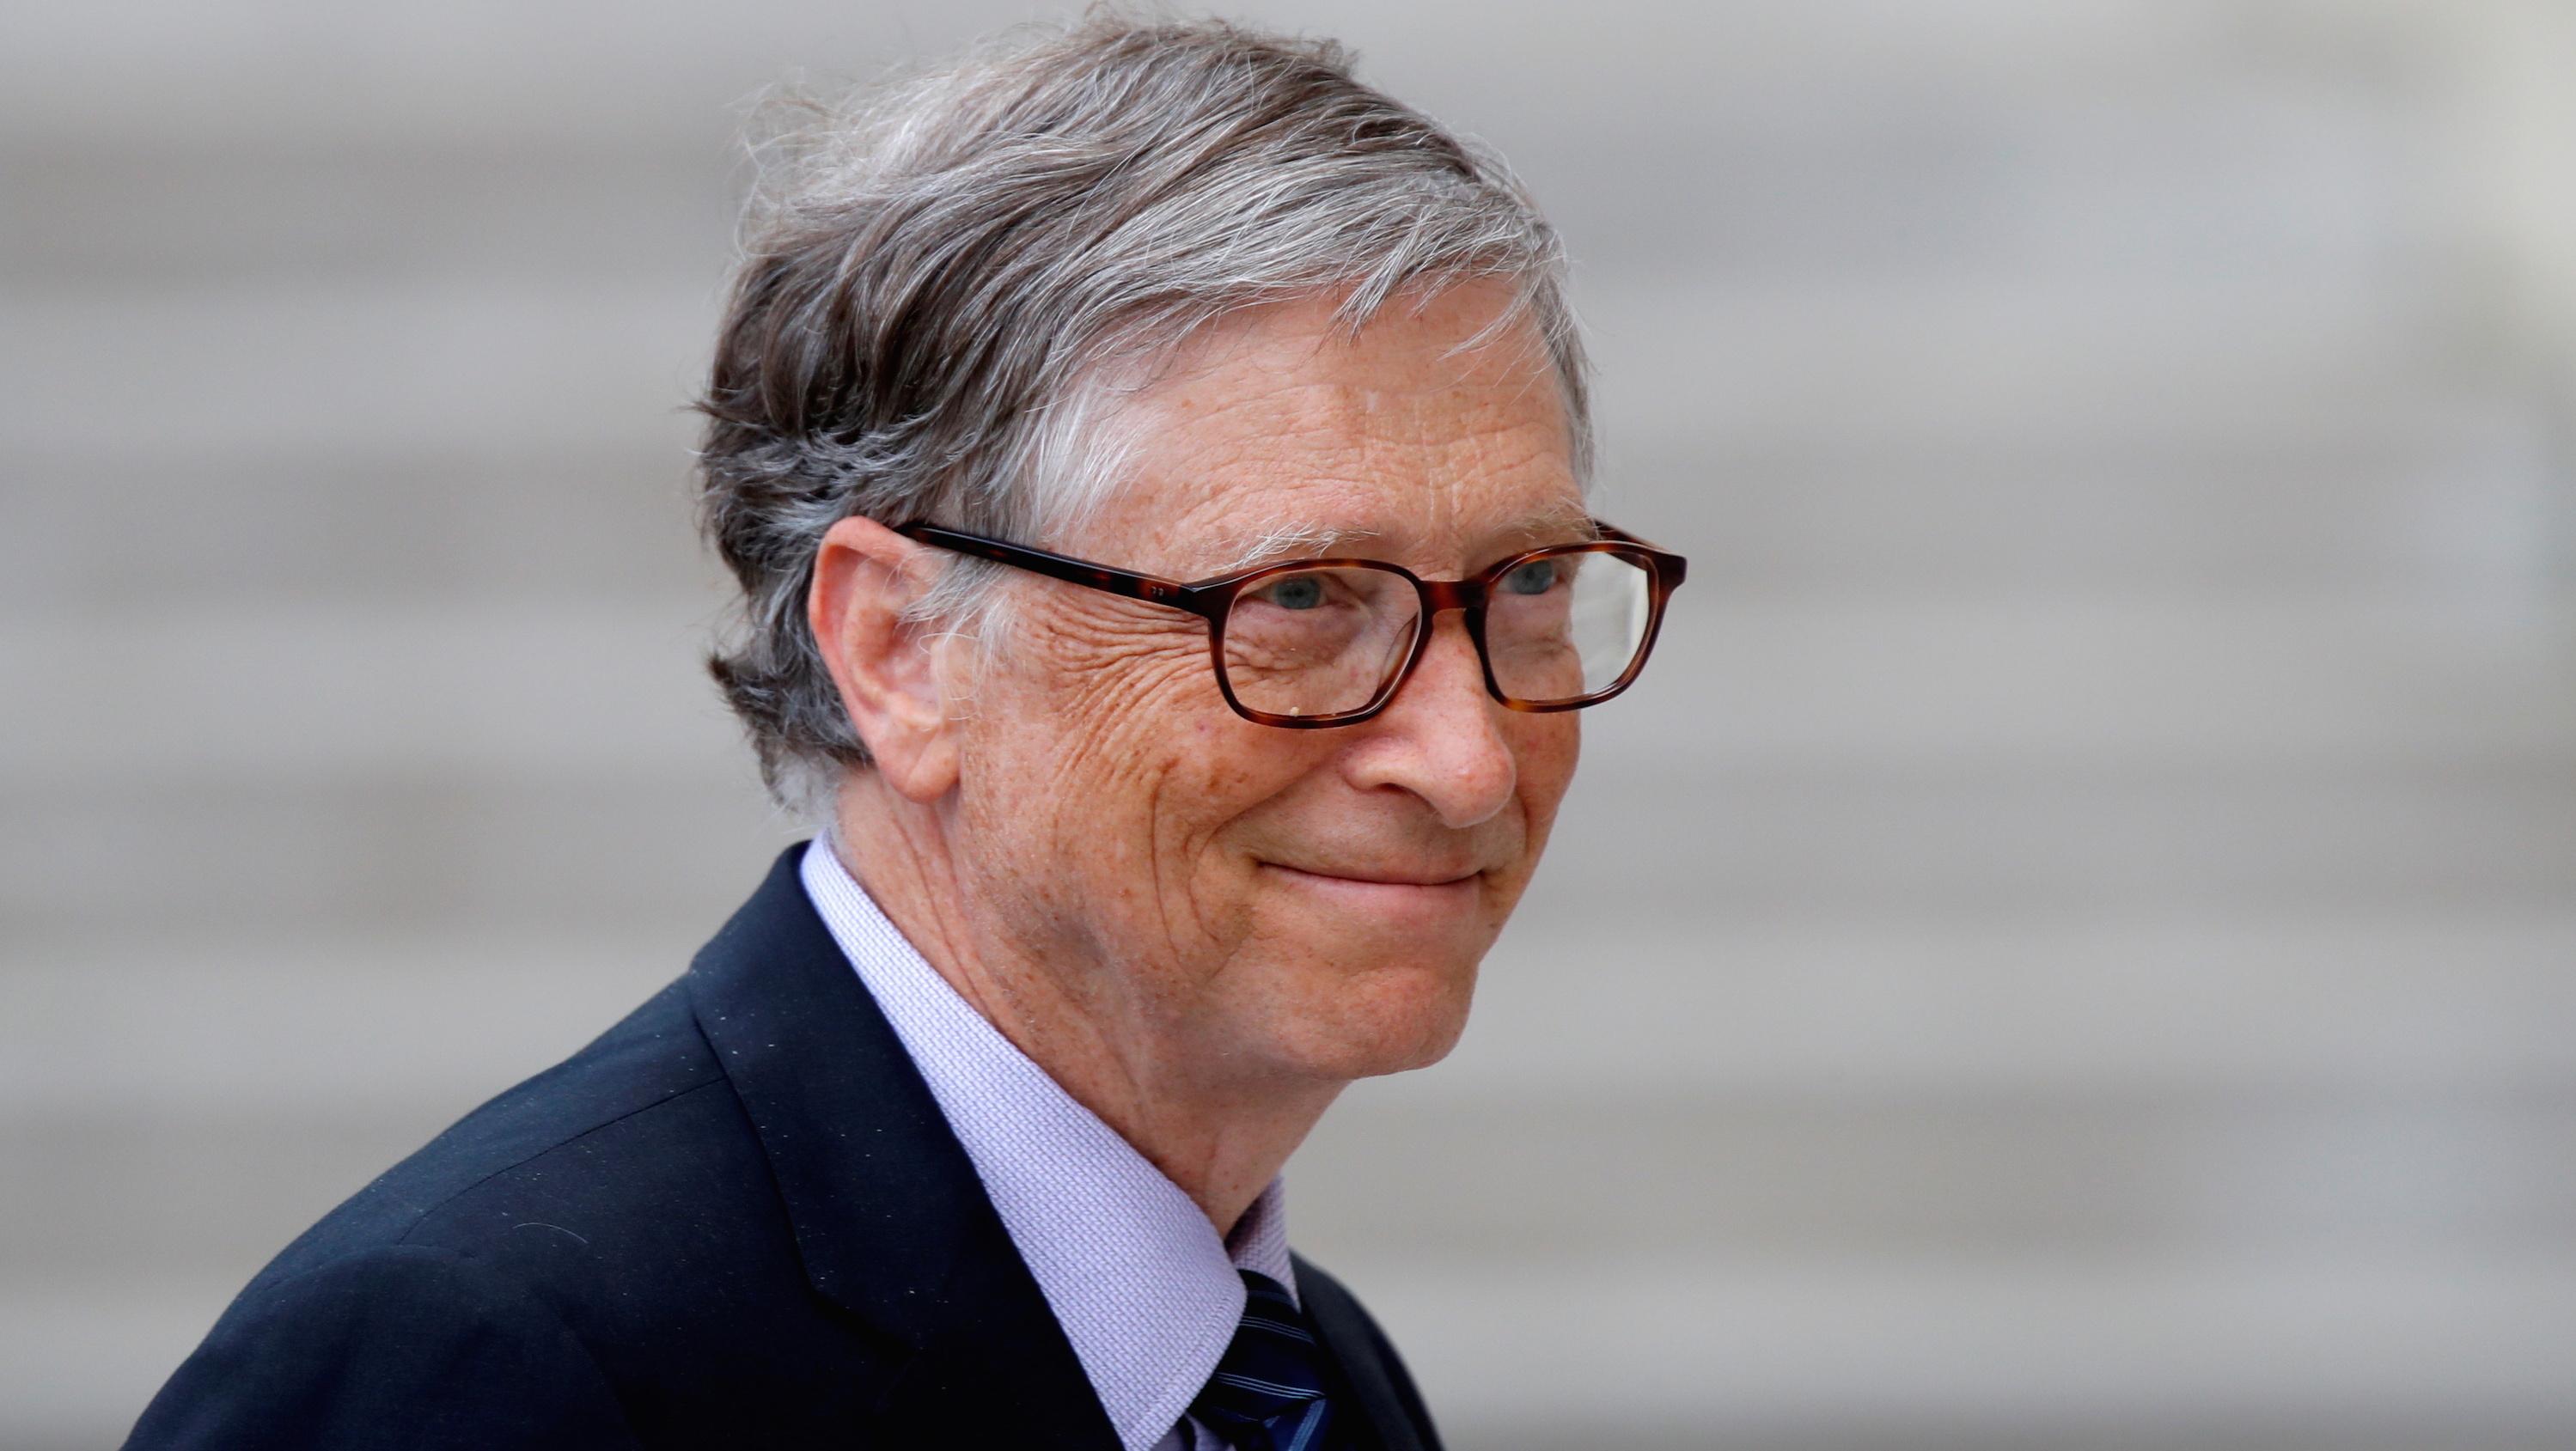 Bill Gates wearing a suit